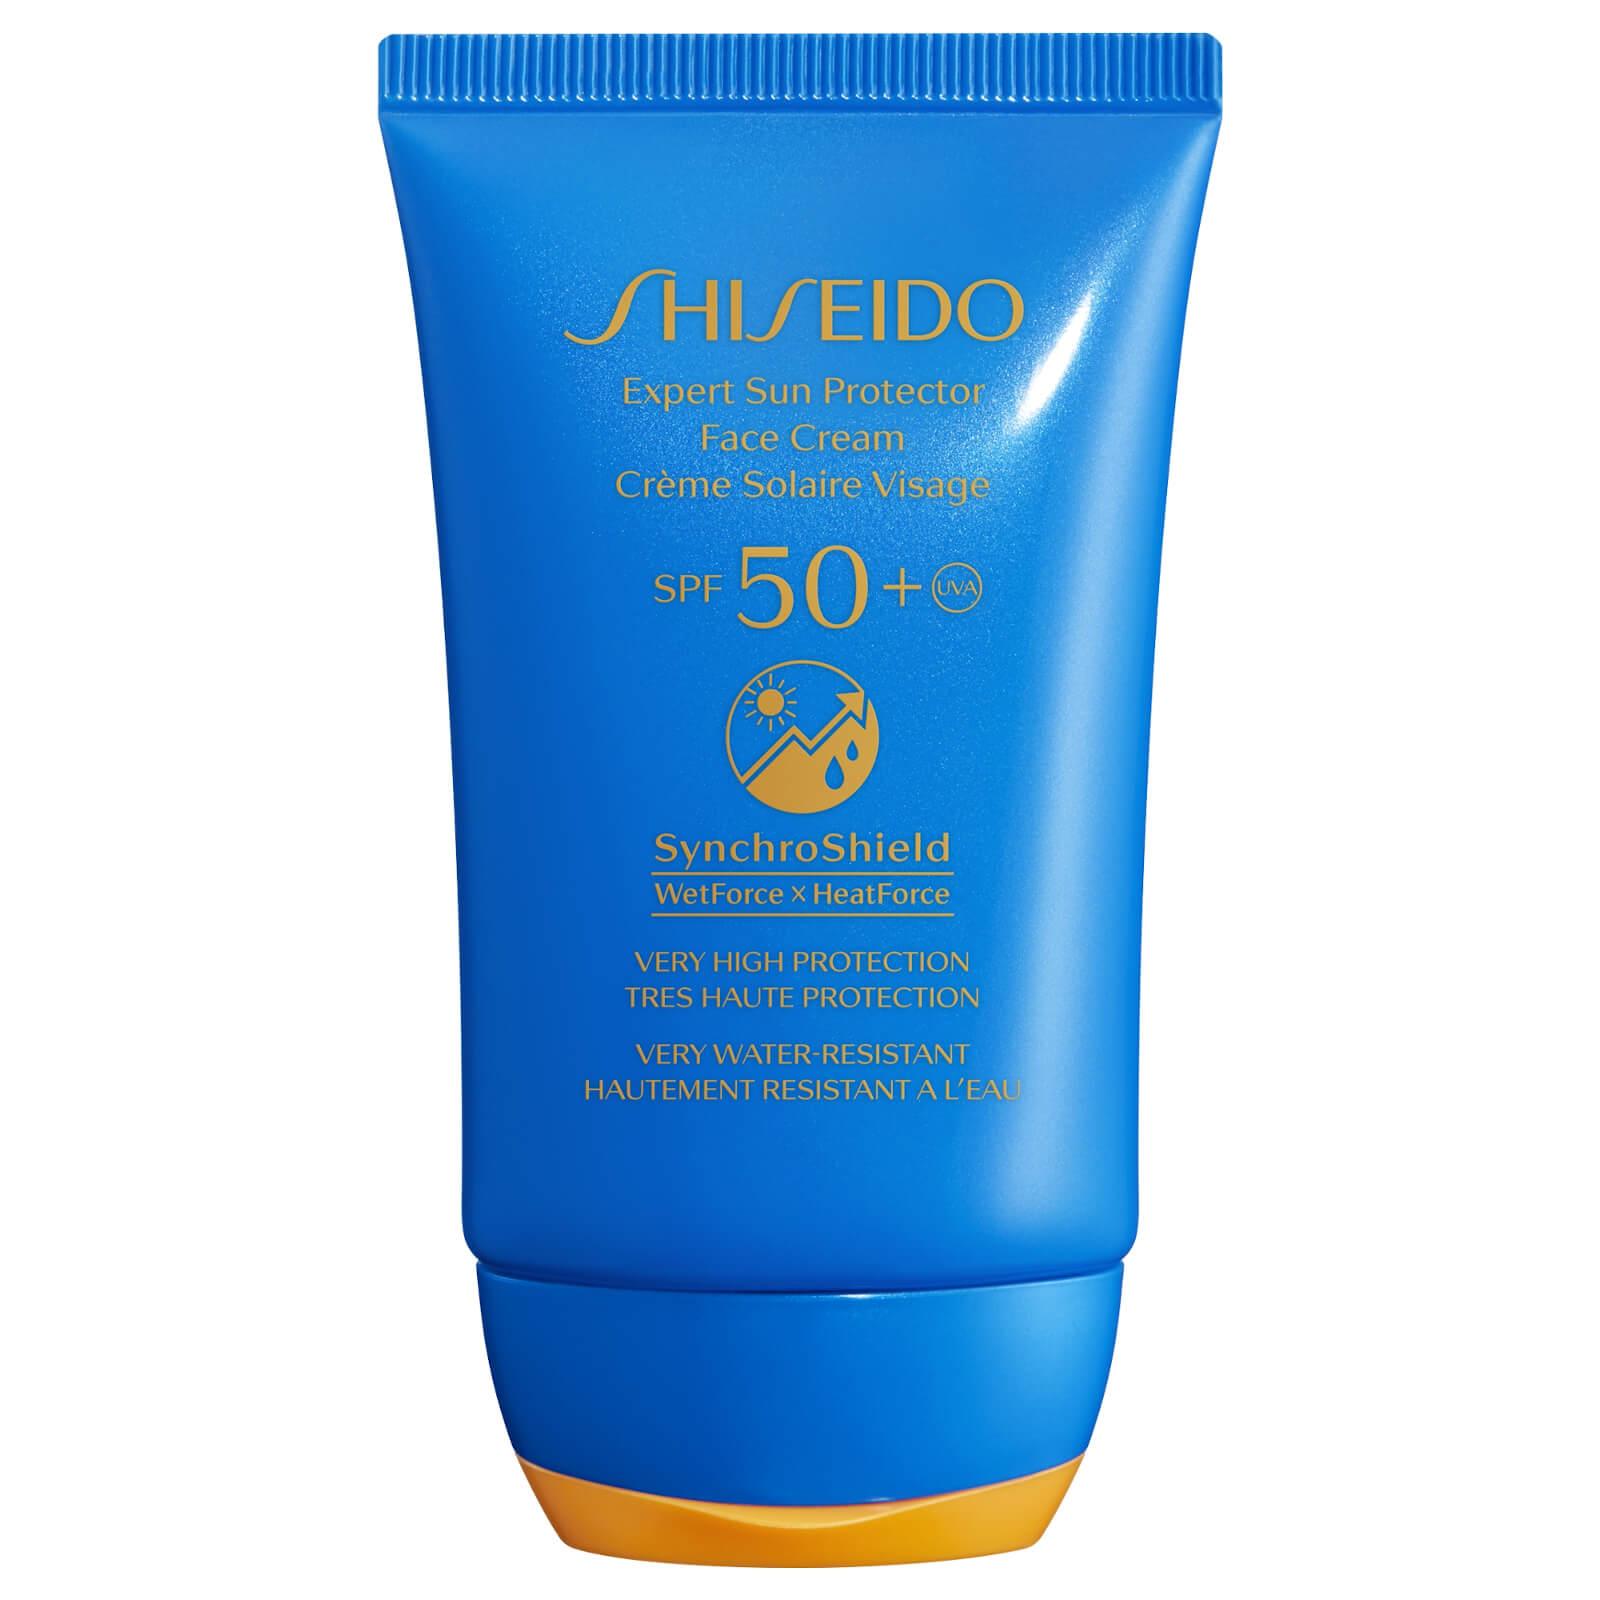 Shiseido 资生堂 新艳阳夏防水防晒乳 SPF50+ 50ml